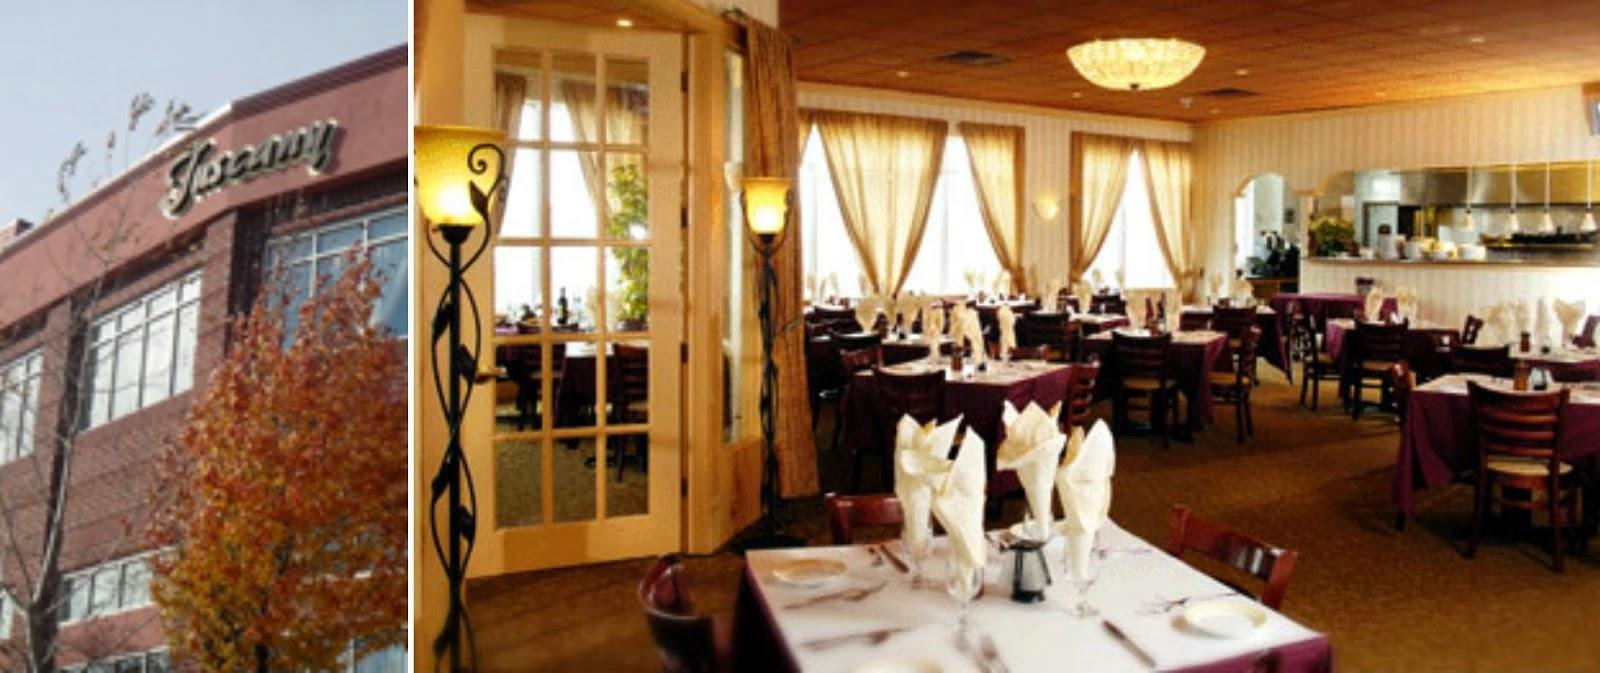 Tuscany Grill Restaurant.com